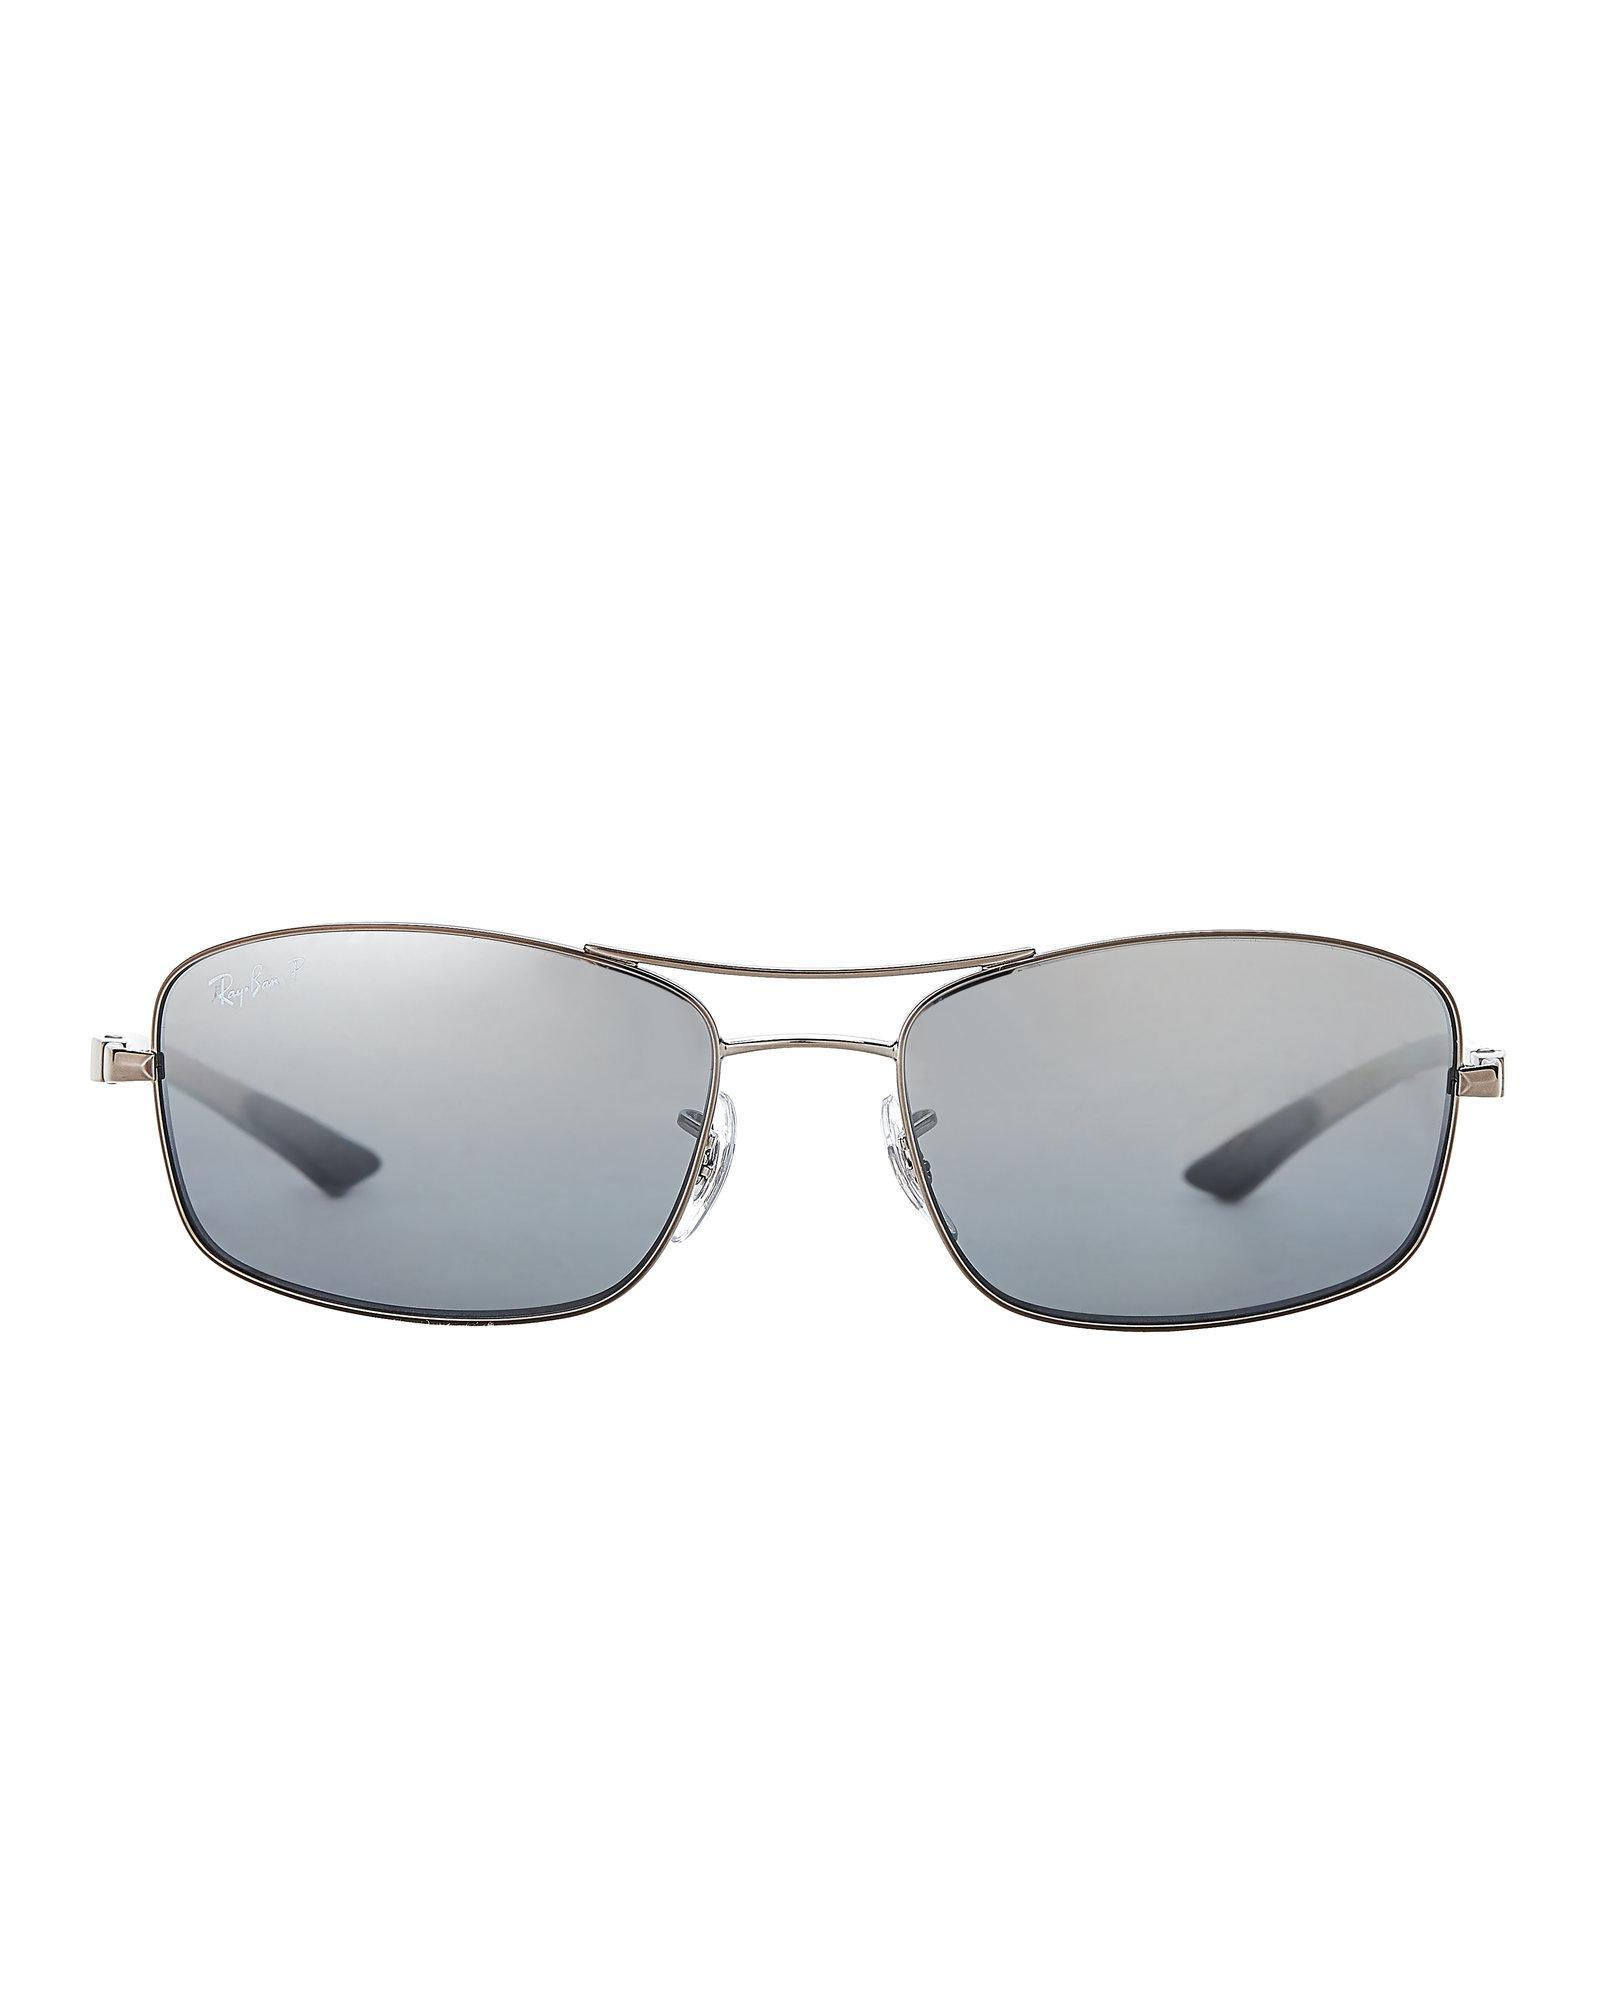 5edd95afcd Lyst - Ray-Ban Rb8309 Silver-tone Rectangular Sunglasses in Metallic ...